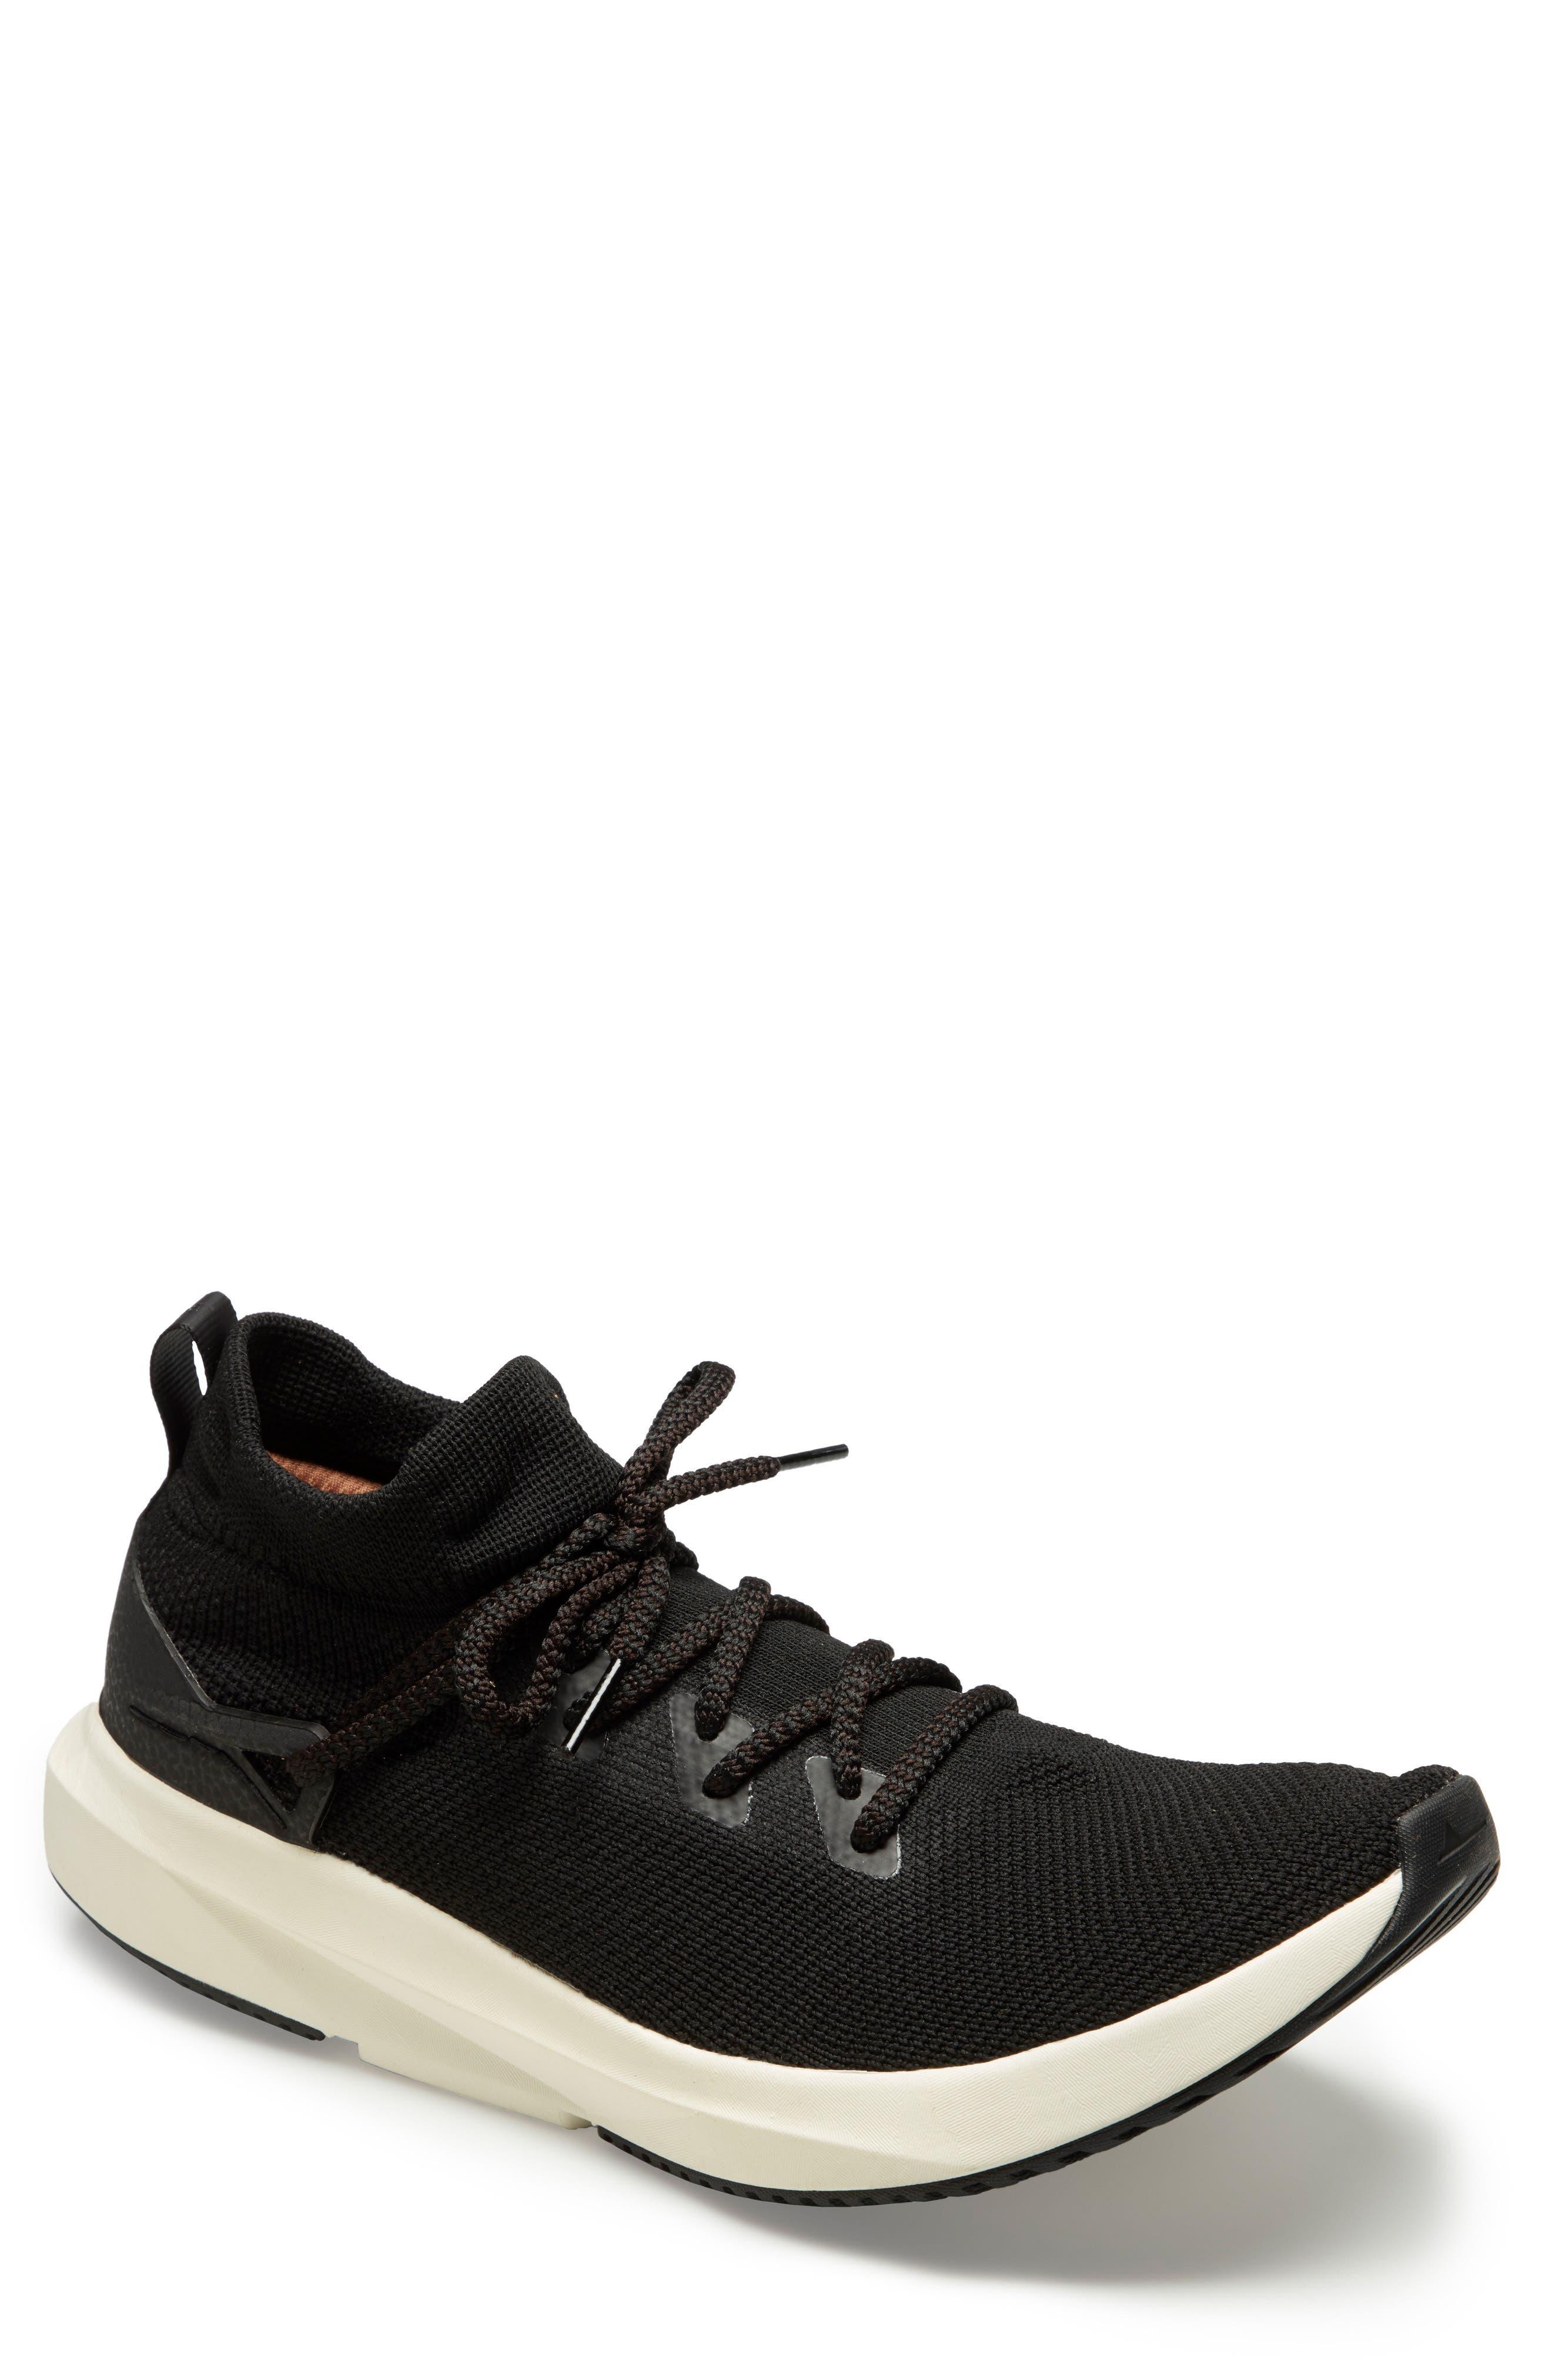 Kaze Sneaker,                         Main,                         color, 011